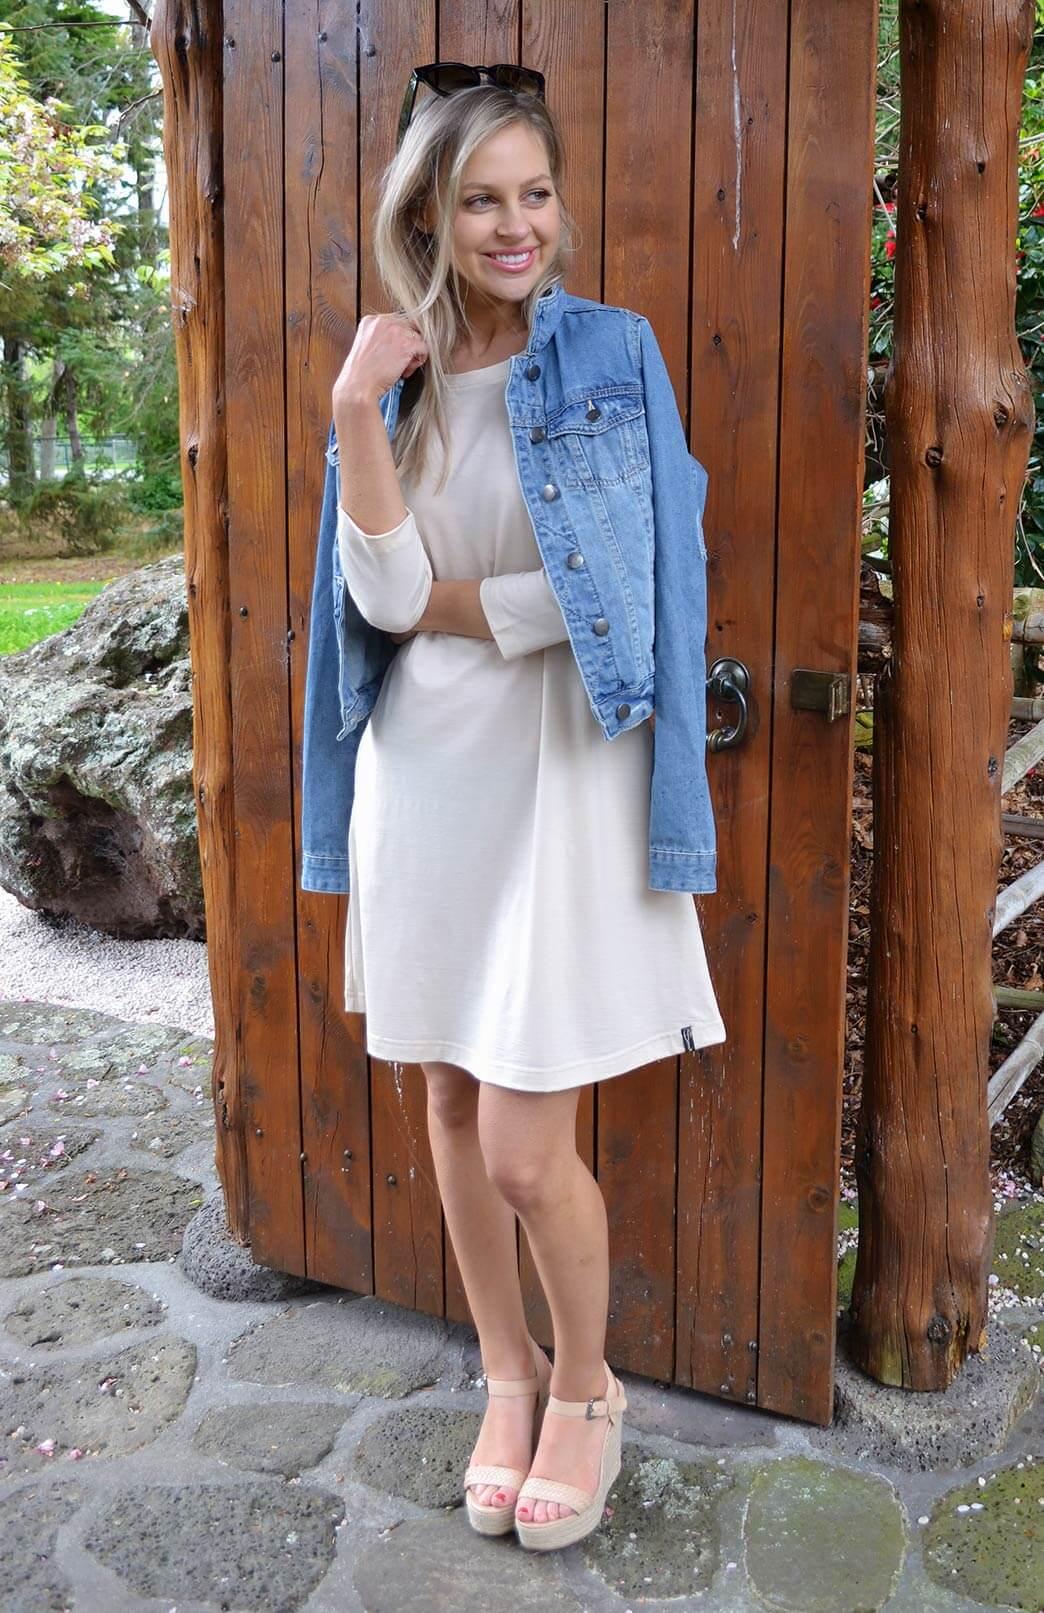 Ellie Swing Dress - Women's Cream Merino Swing Dress with sleeves and pockets - Smitten Merino Tasmania Australia